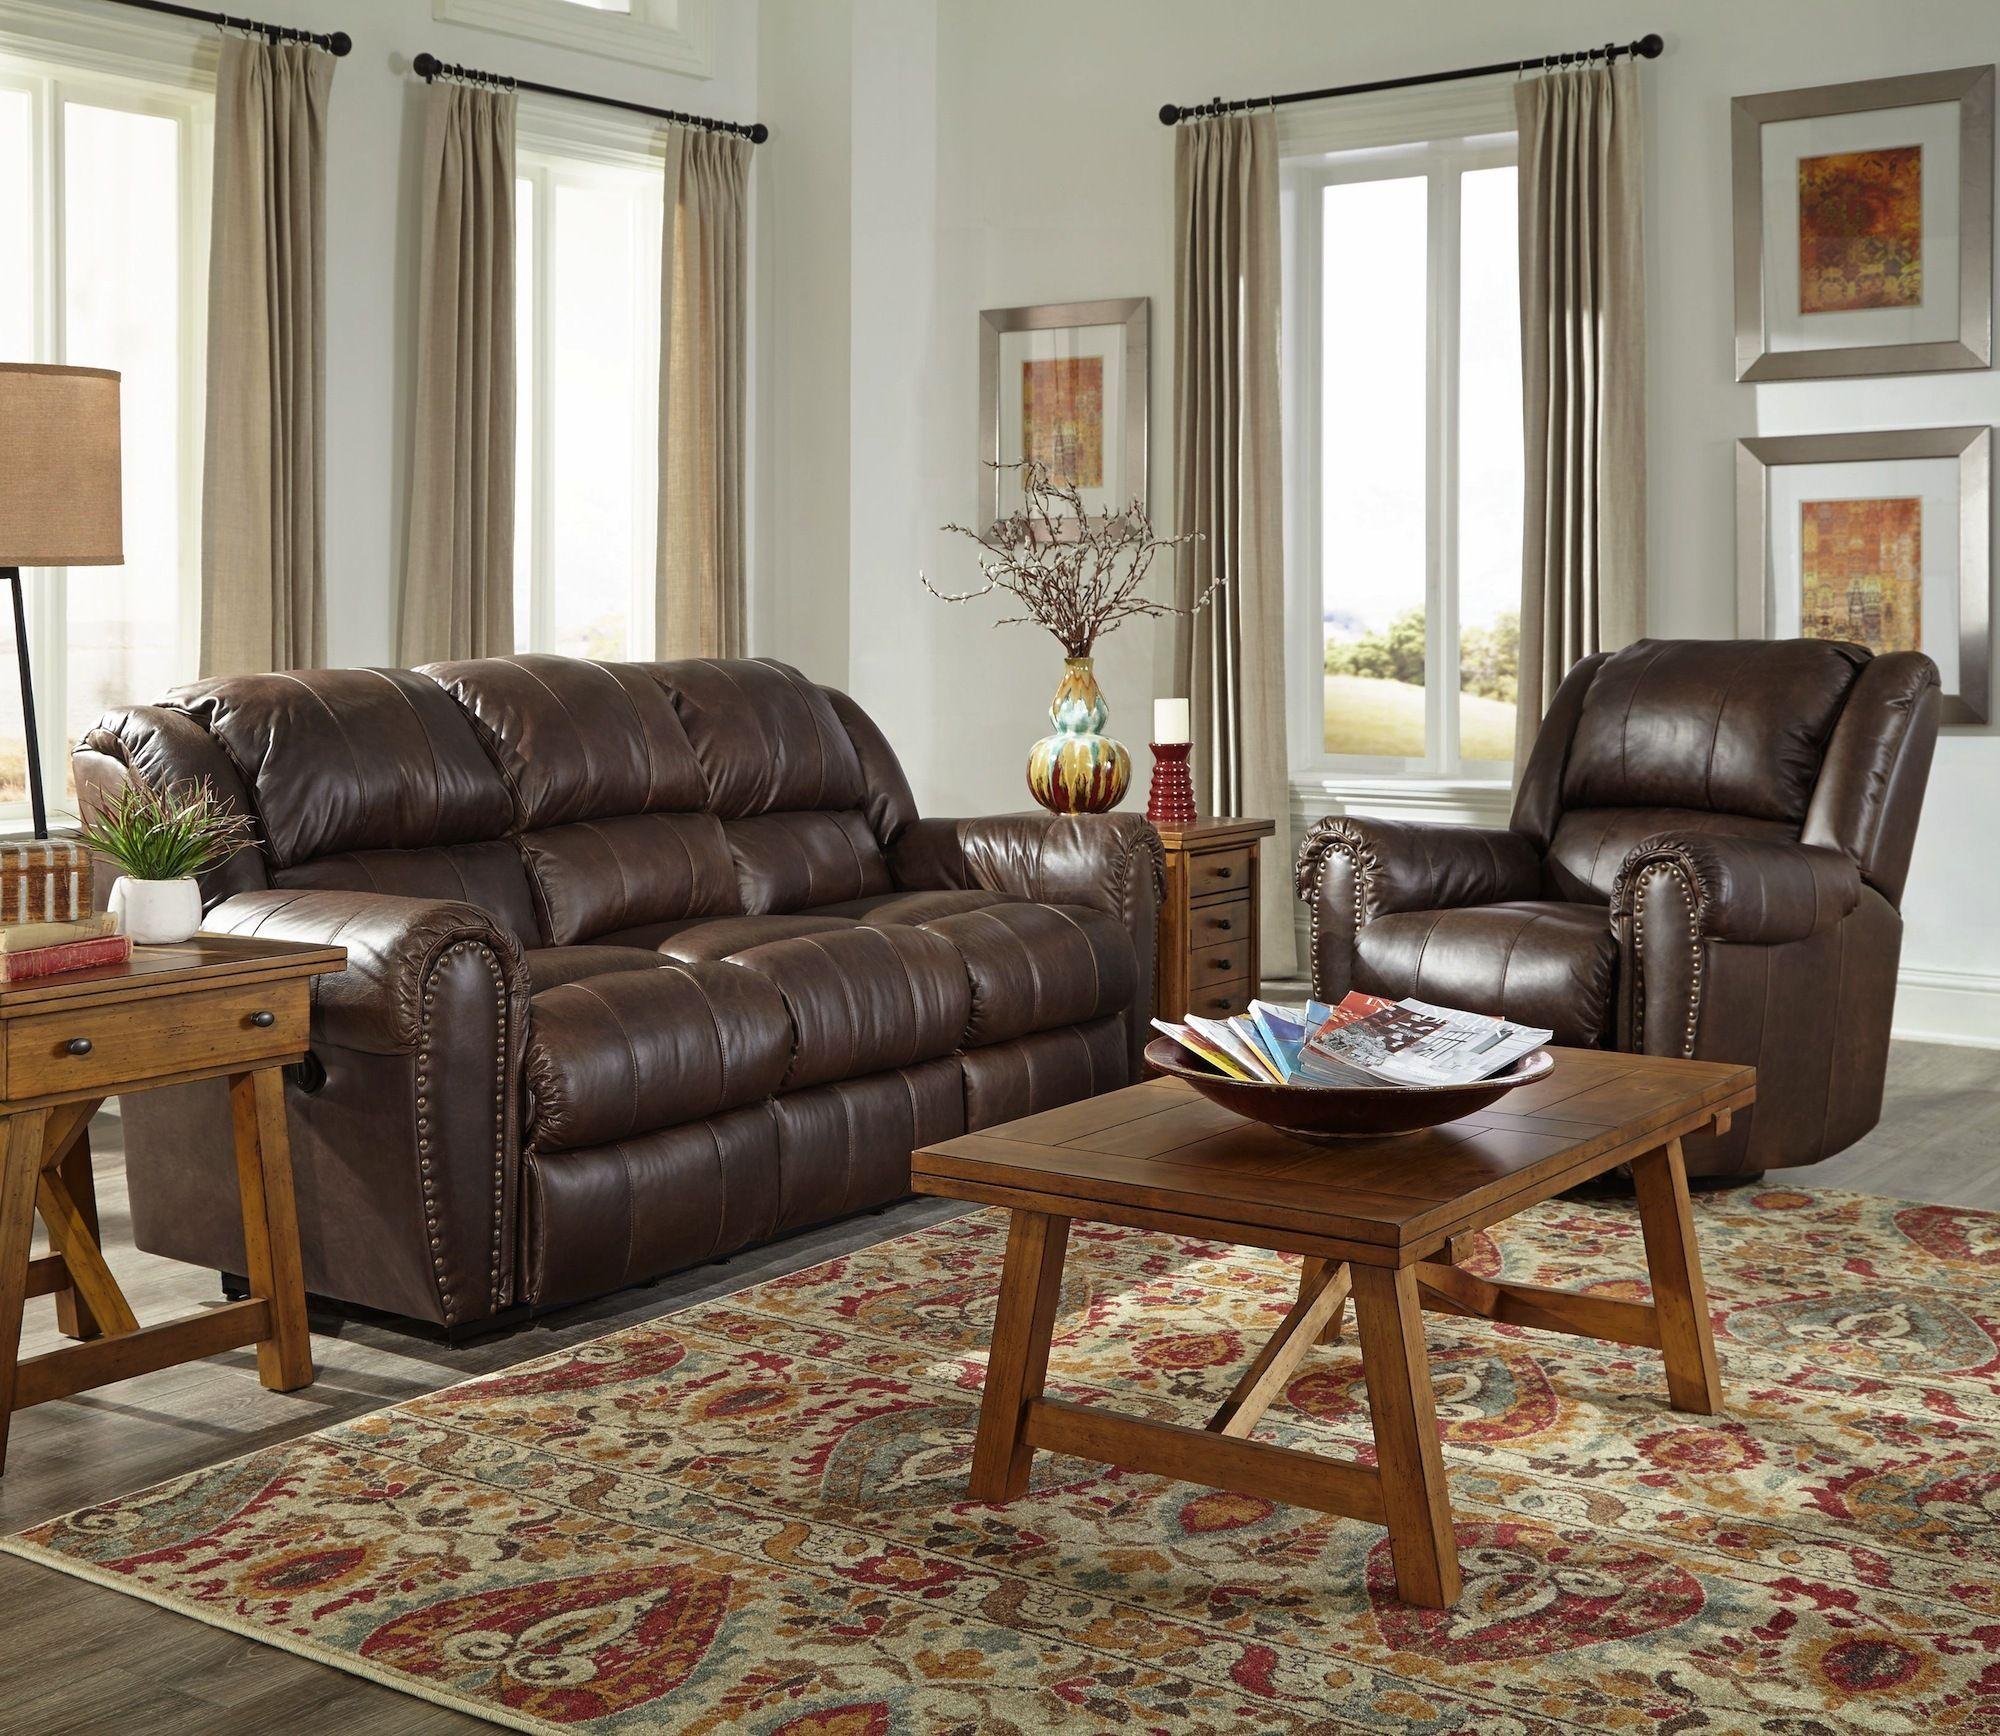 Summerlin Power Reclining Sofa Set | Lane Furniture | Home Gallery